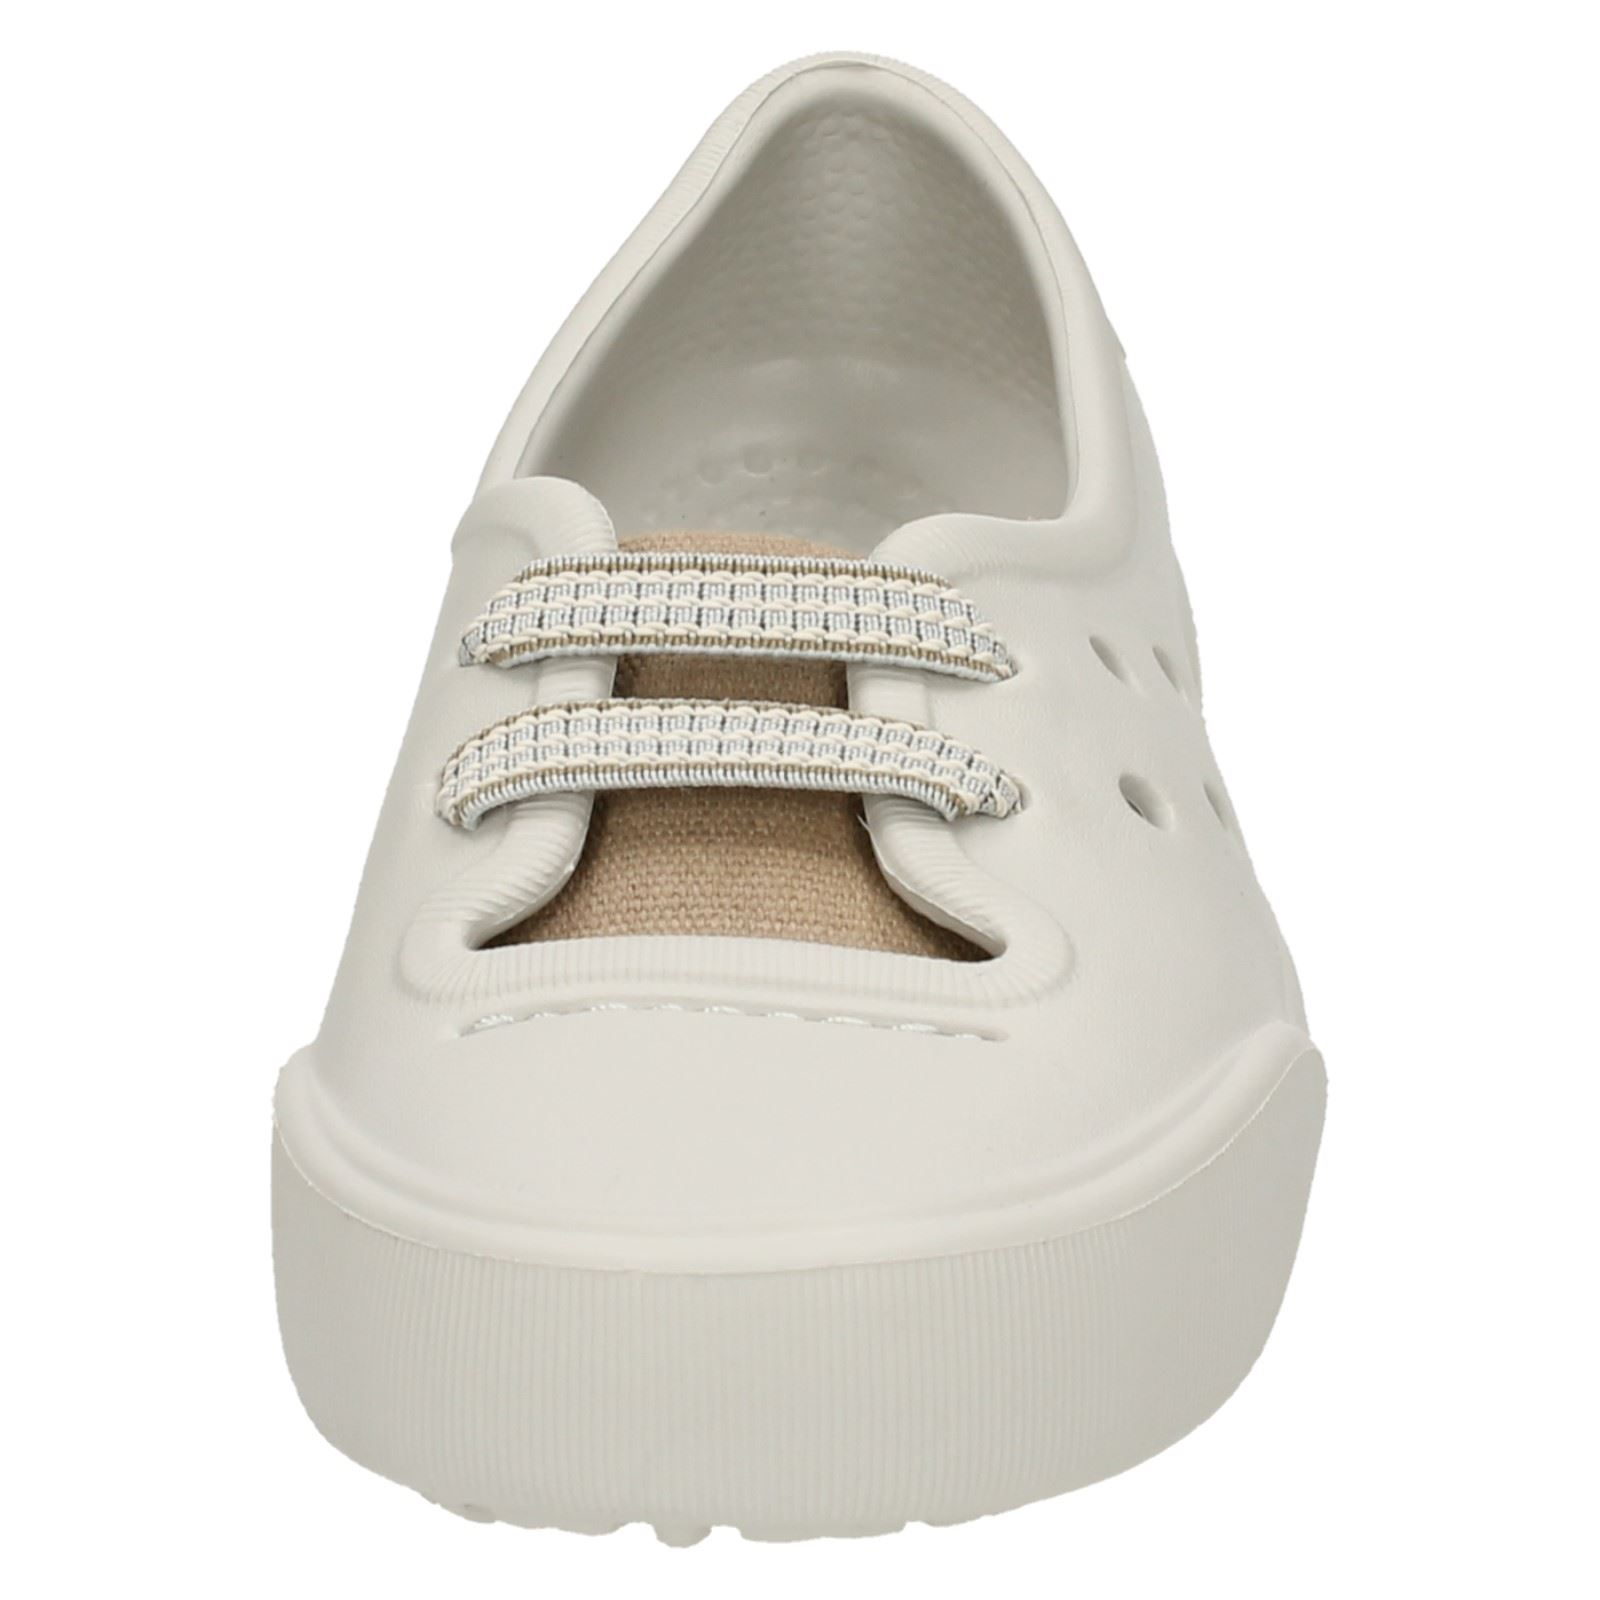 Crocs Filles Slip on Flats-nahanijunior